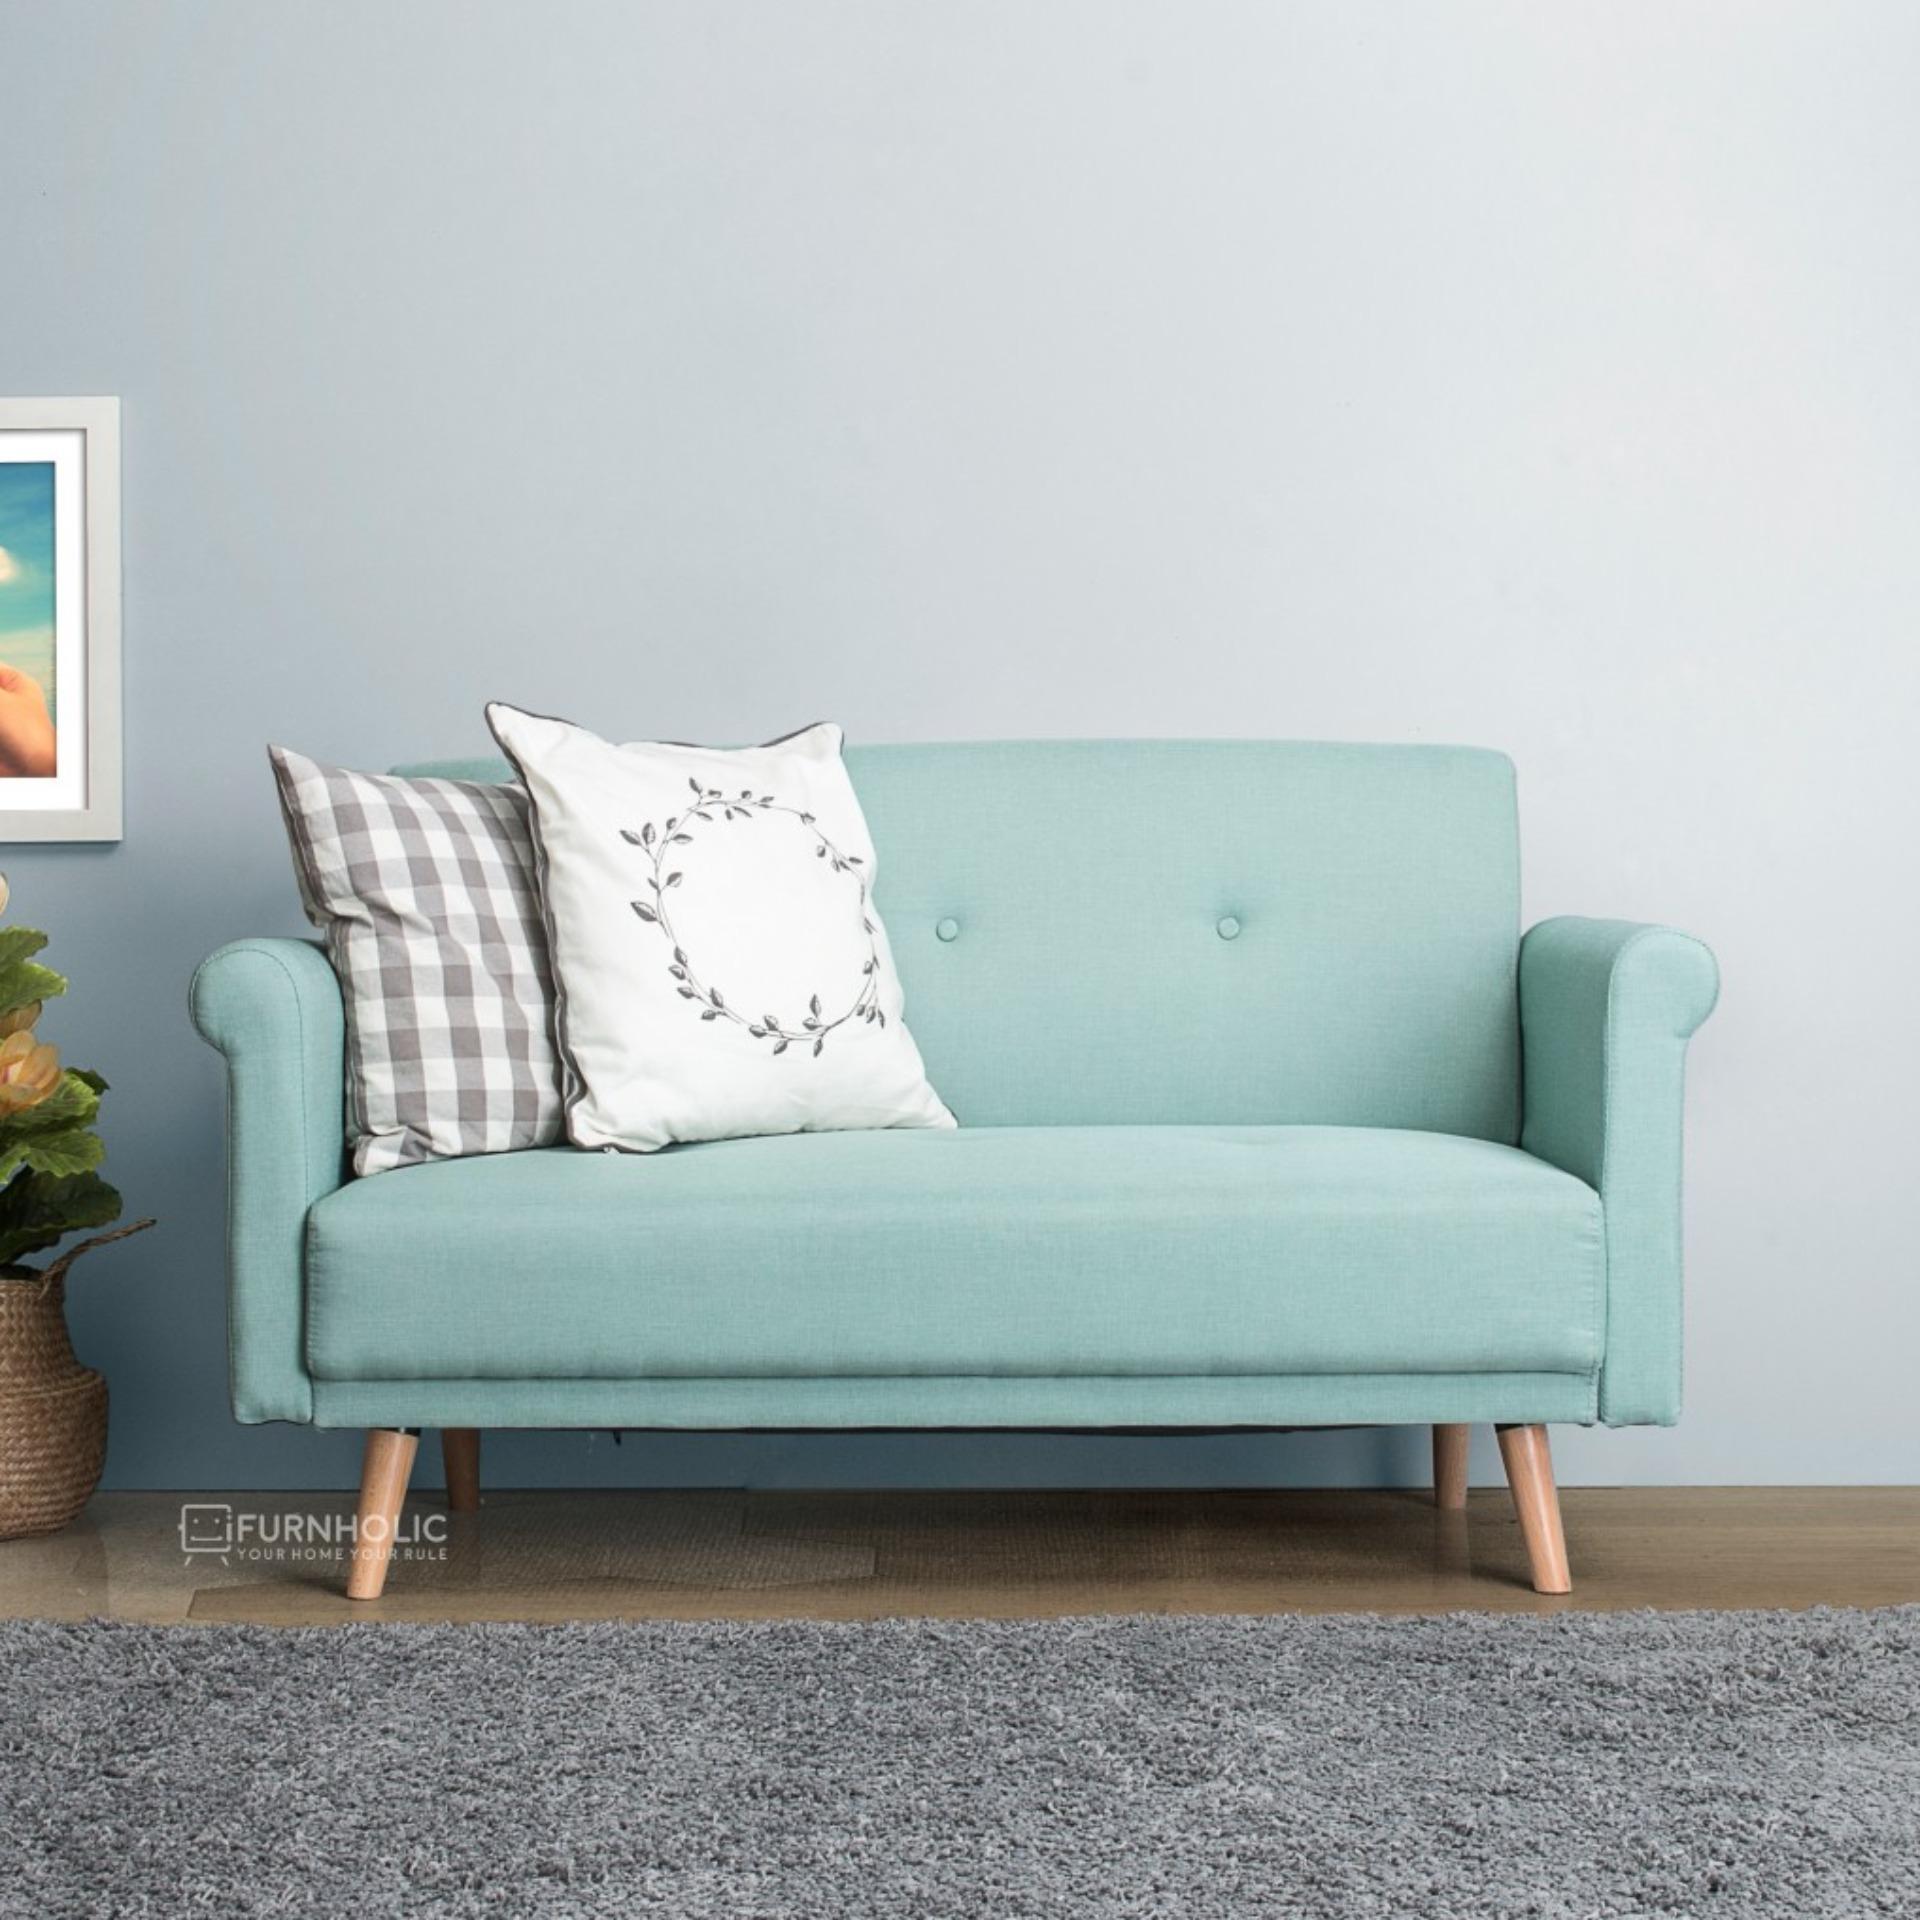 iFurnholic Mya Love Sofa - Kursi Sofa - Toscana Blue - Gratis Pengiriman Pulau Jawa dan Denpasar